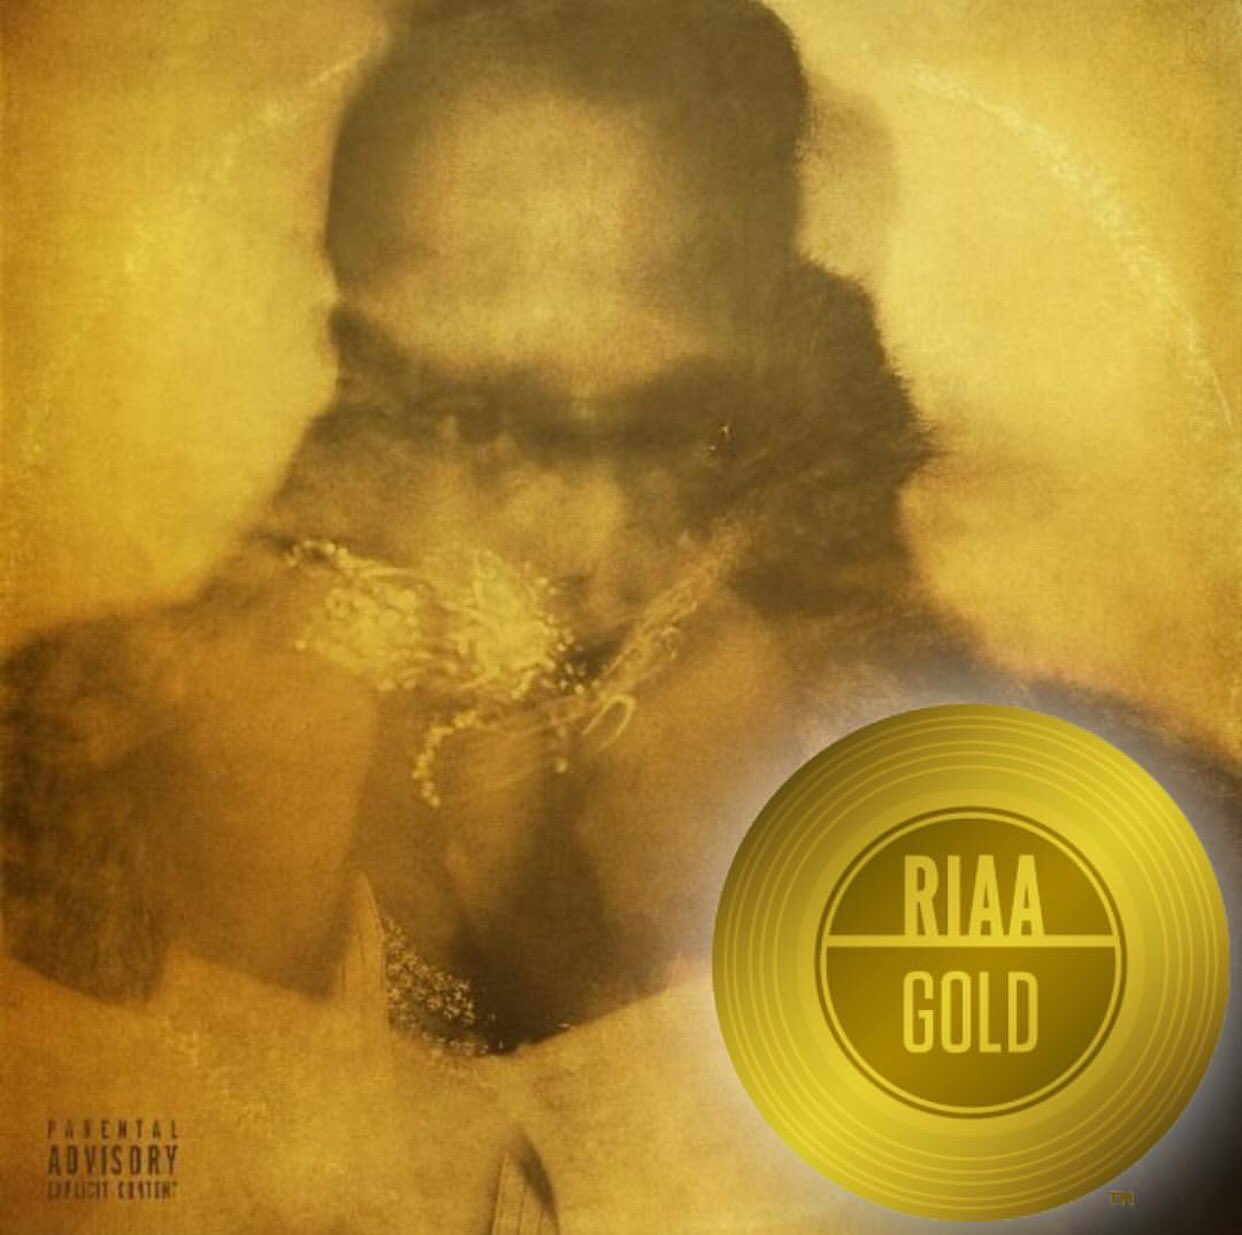 ��@1future has earned his FIFTH RIAA Album Award! #FUTURE is now Gold!�� #beEPIC �� @RIAA https://t.co/uvk7EsRLgA